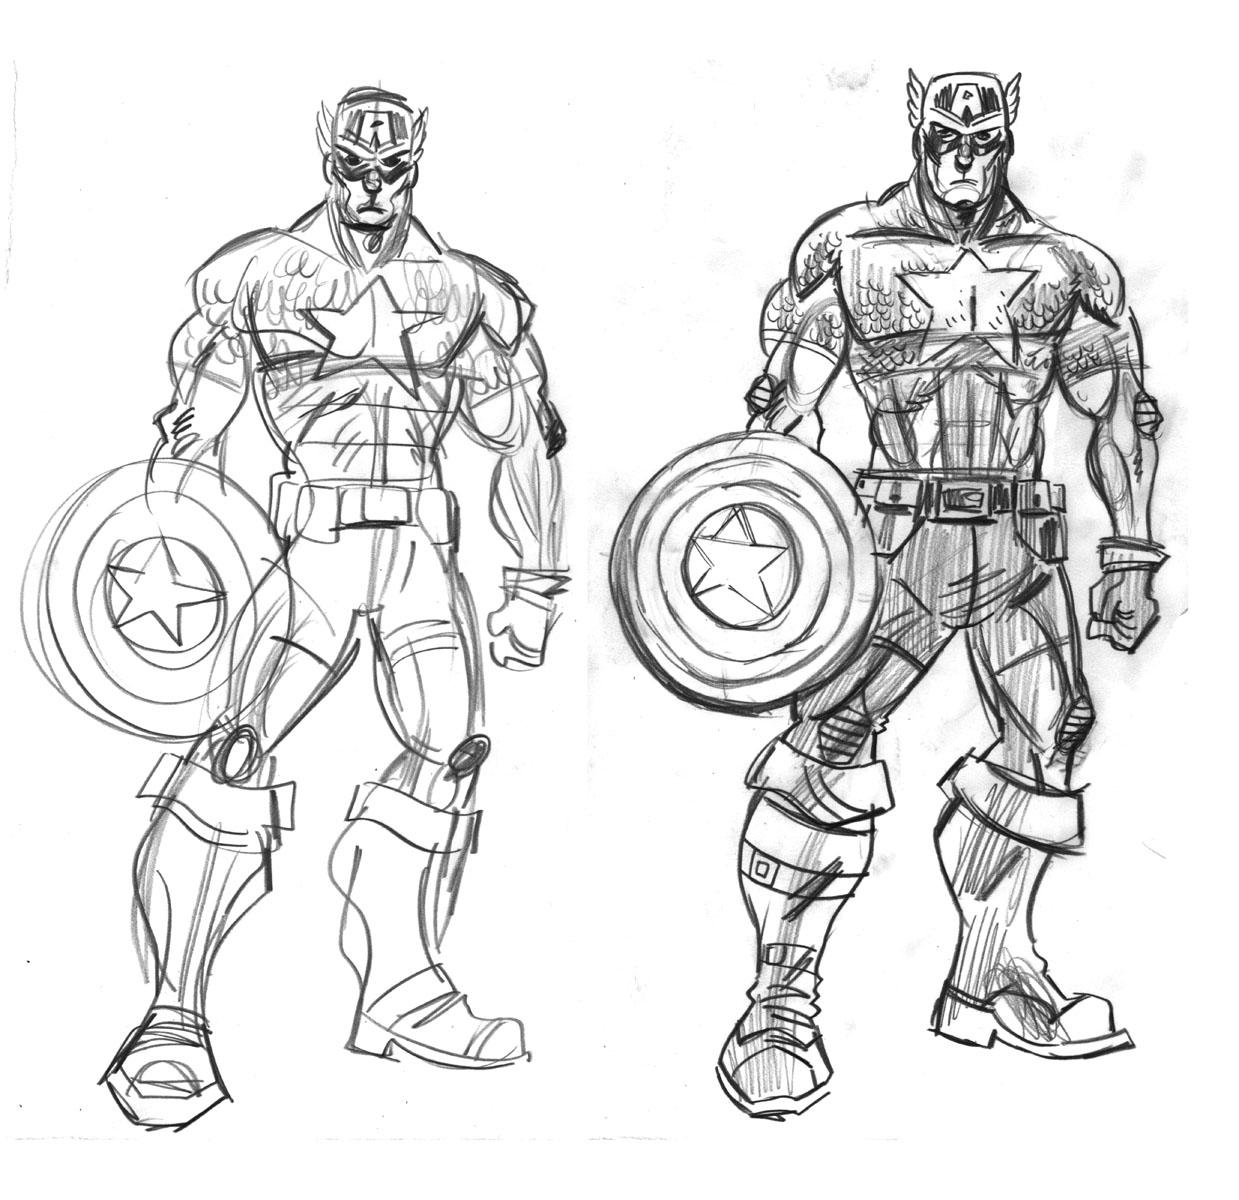 Único Dibujos Para Colorear Capitán América Galería - Dibujos Para ...